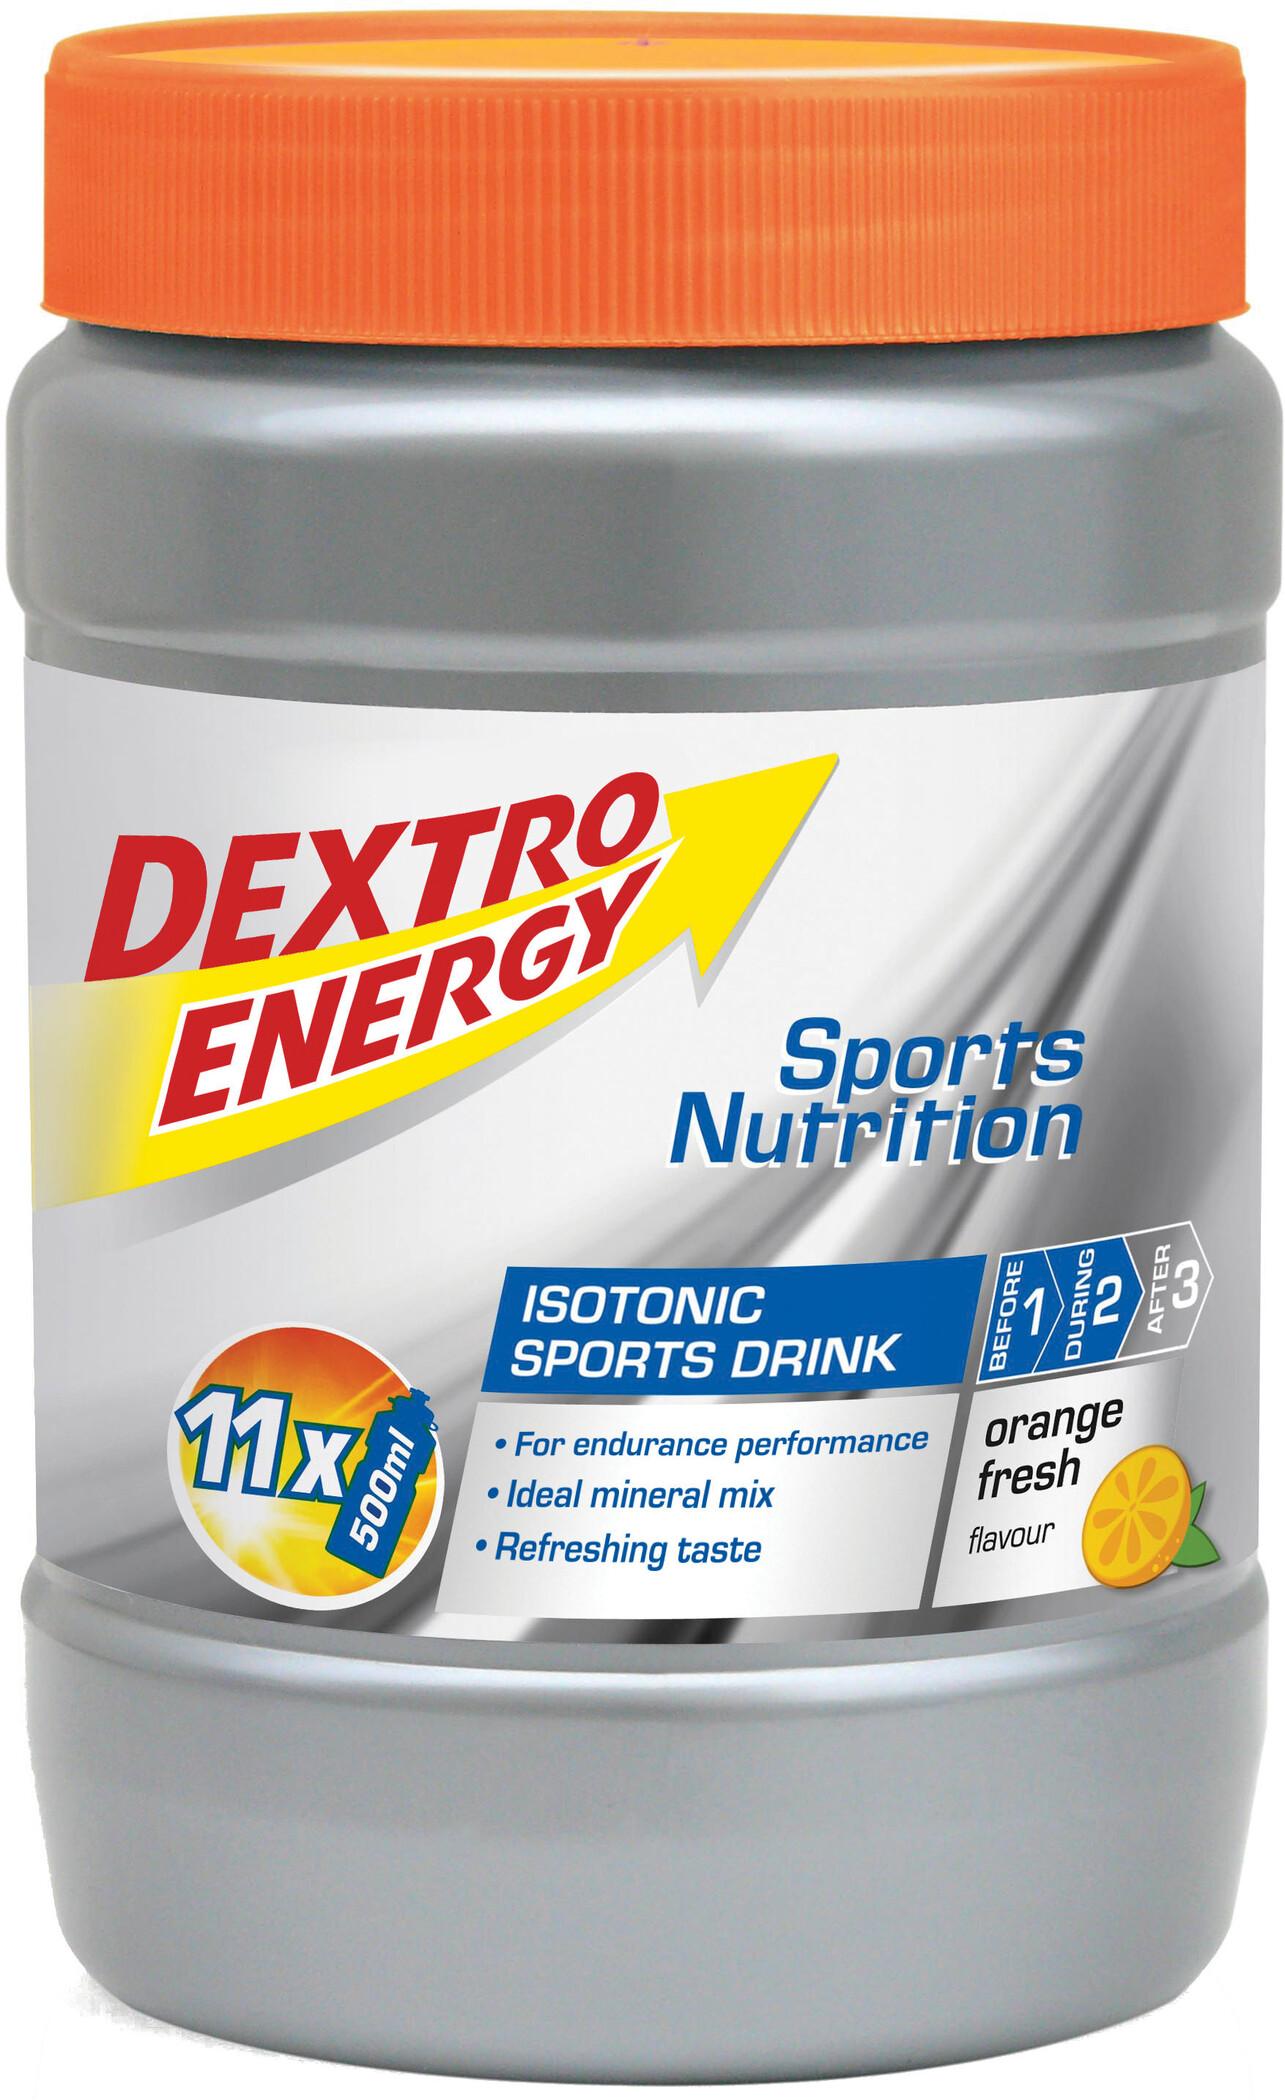 Dextro Energy Isotonic Sports Drink 440g, Orange Fresh (2019) | Energy drinks